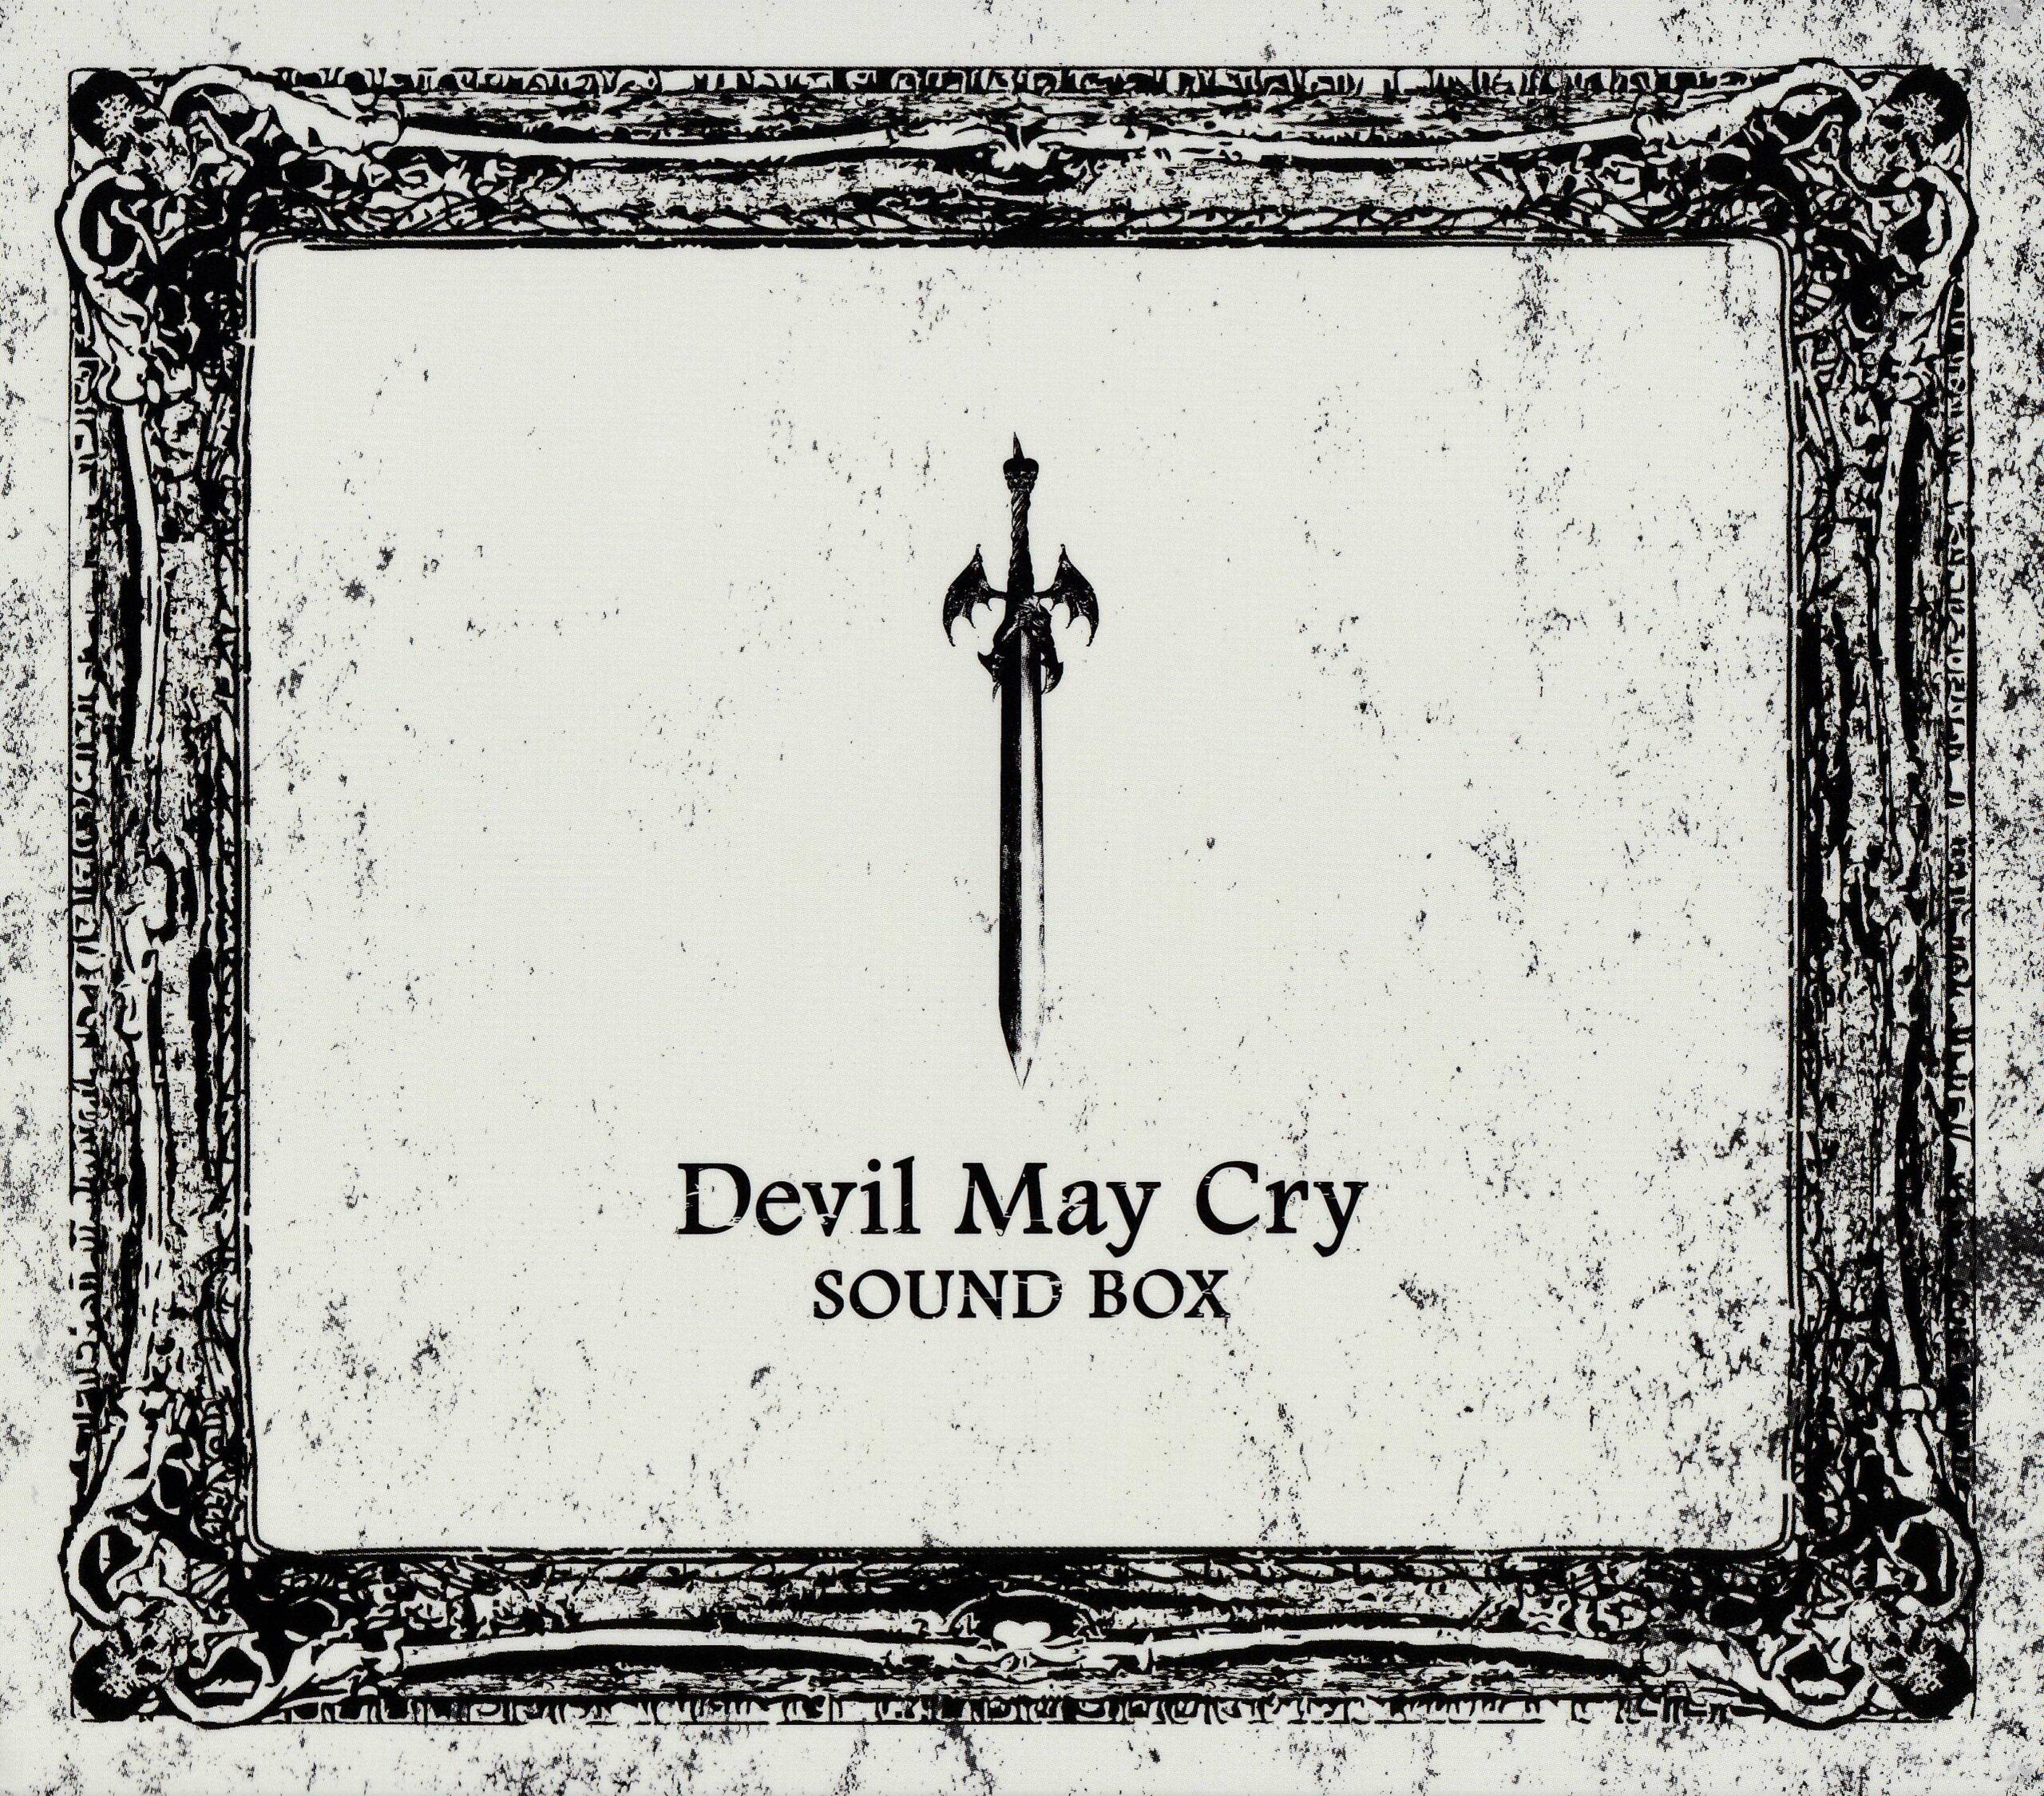 Devil May Cry《Devil May Cry Sound Box》[CD级无损/44.1kHz/16bit]